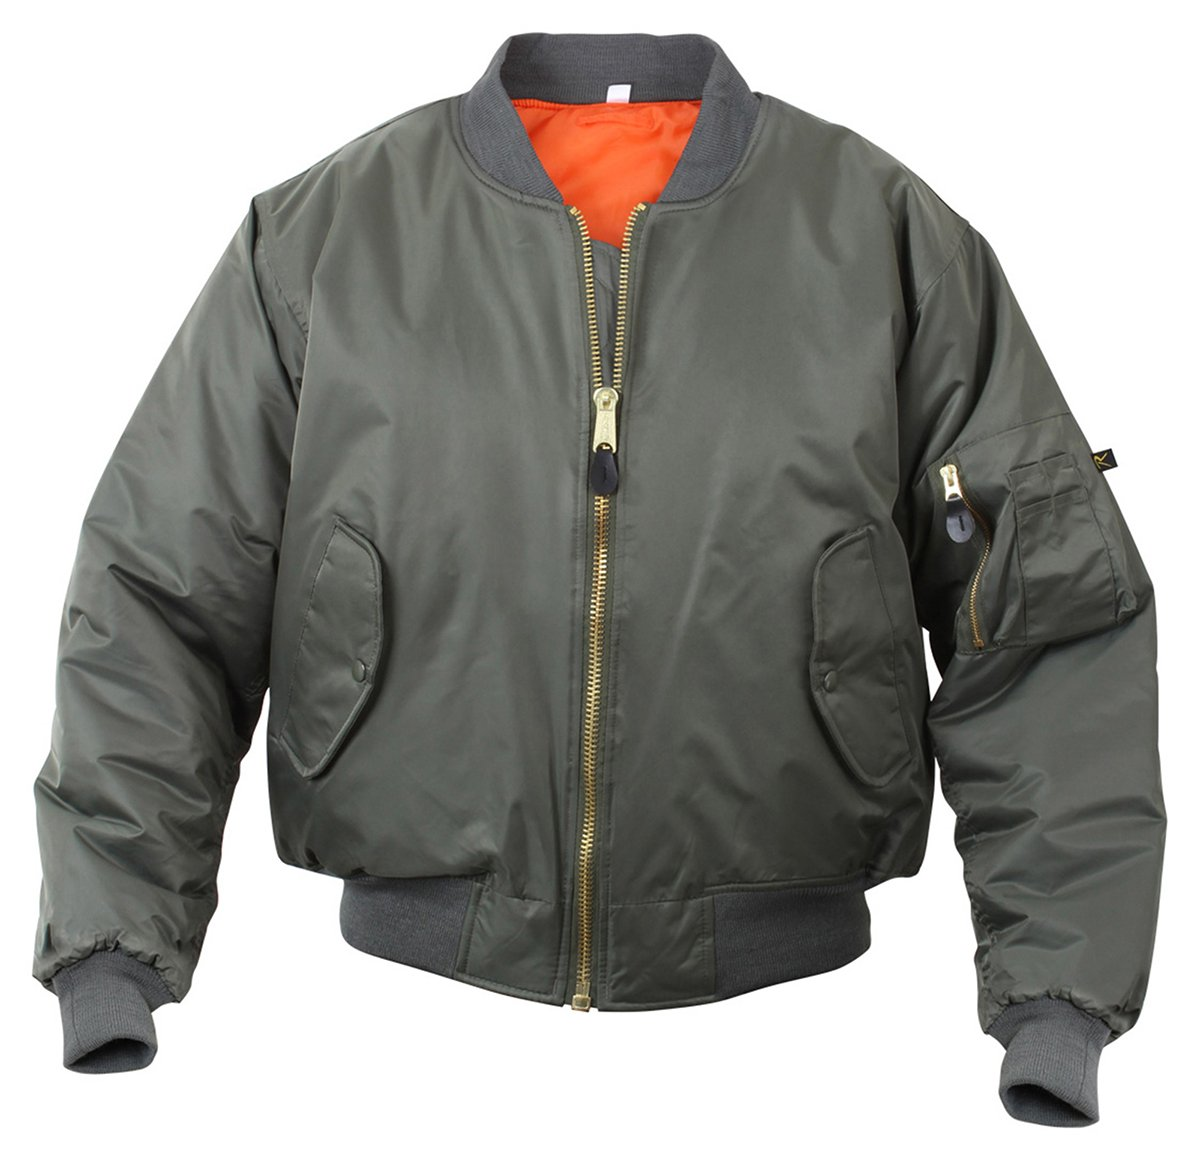 Amazon.com: Rothco Kids Ma-1 Flight Jacket-Black: Sports & Outdoors